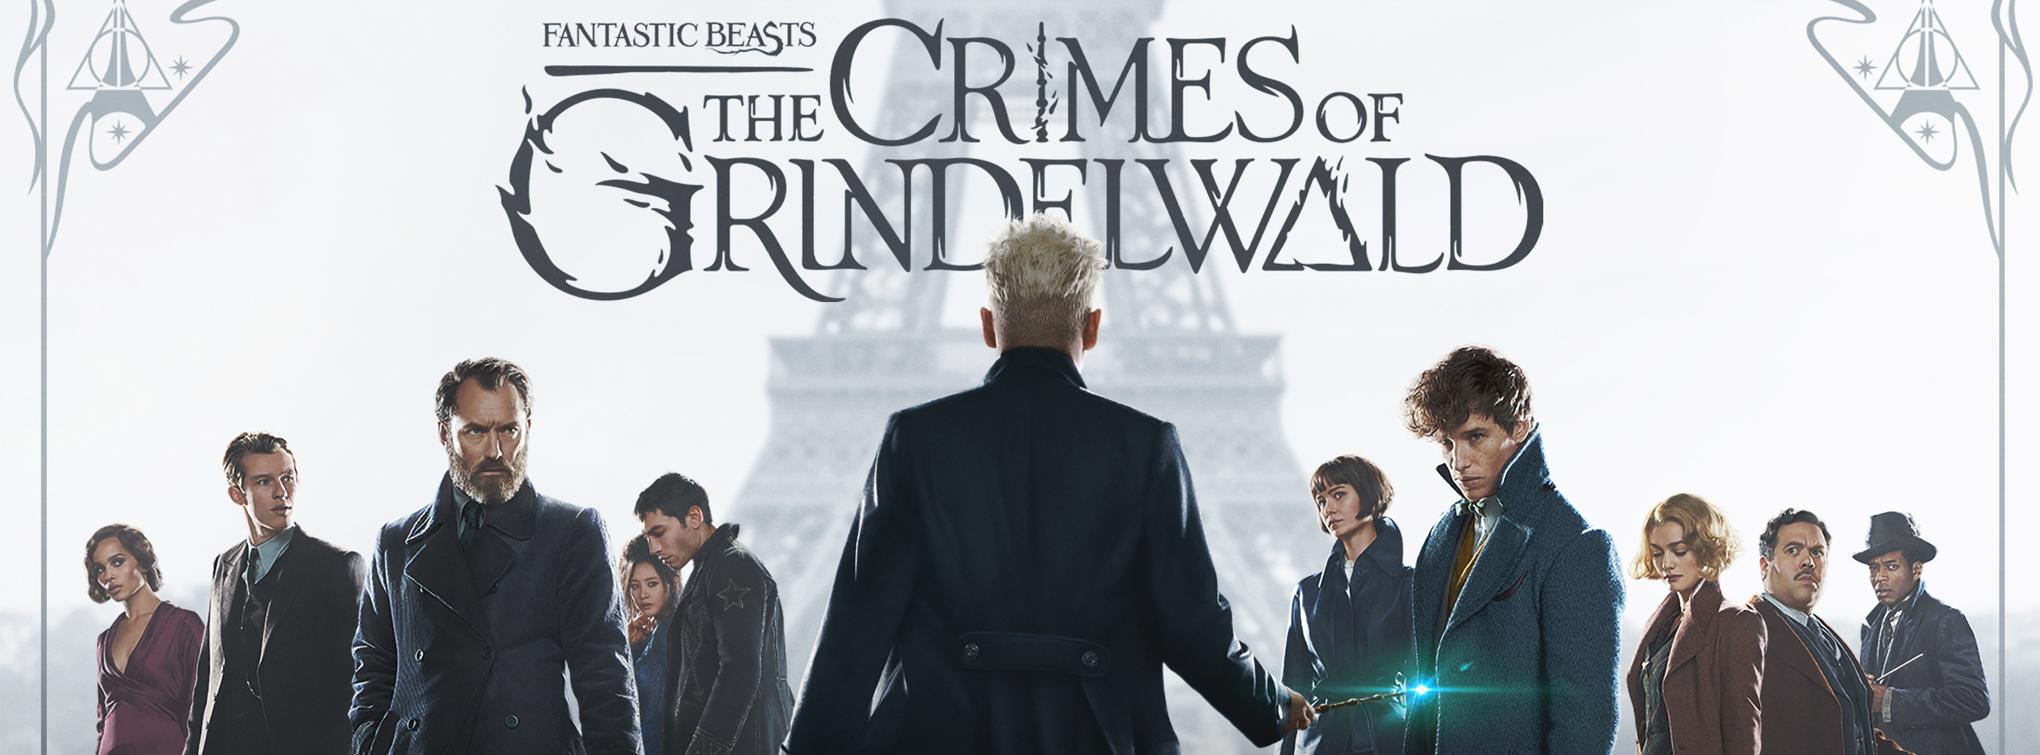 Slider image for Fantastic Beasts and the Crimes of Grindelwald